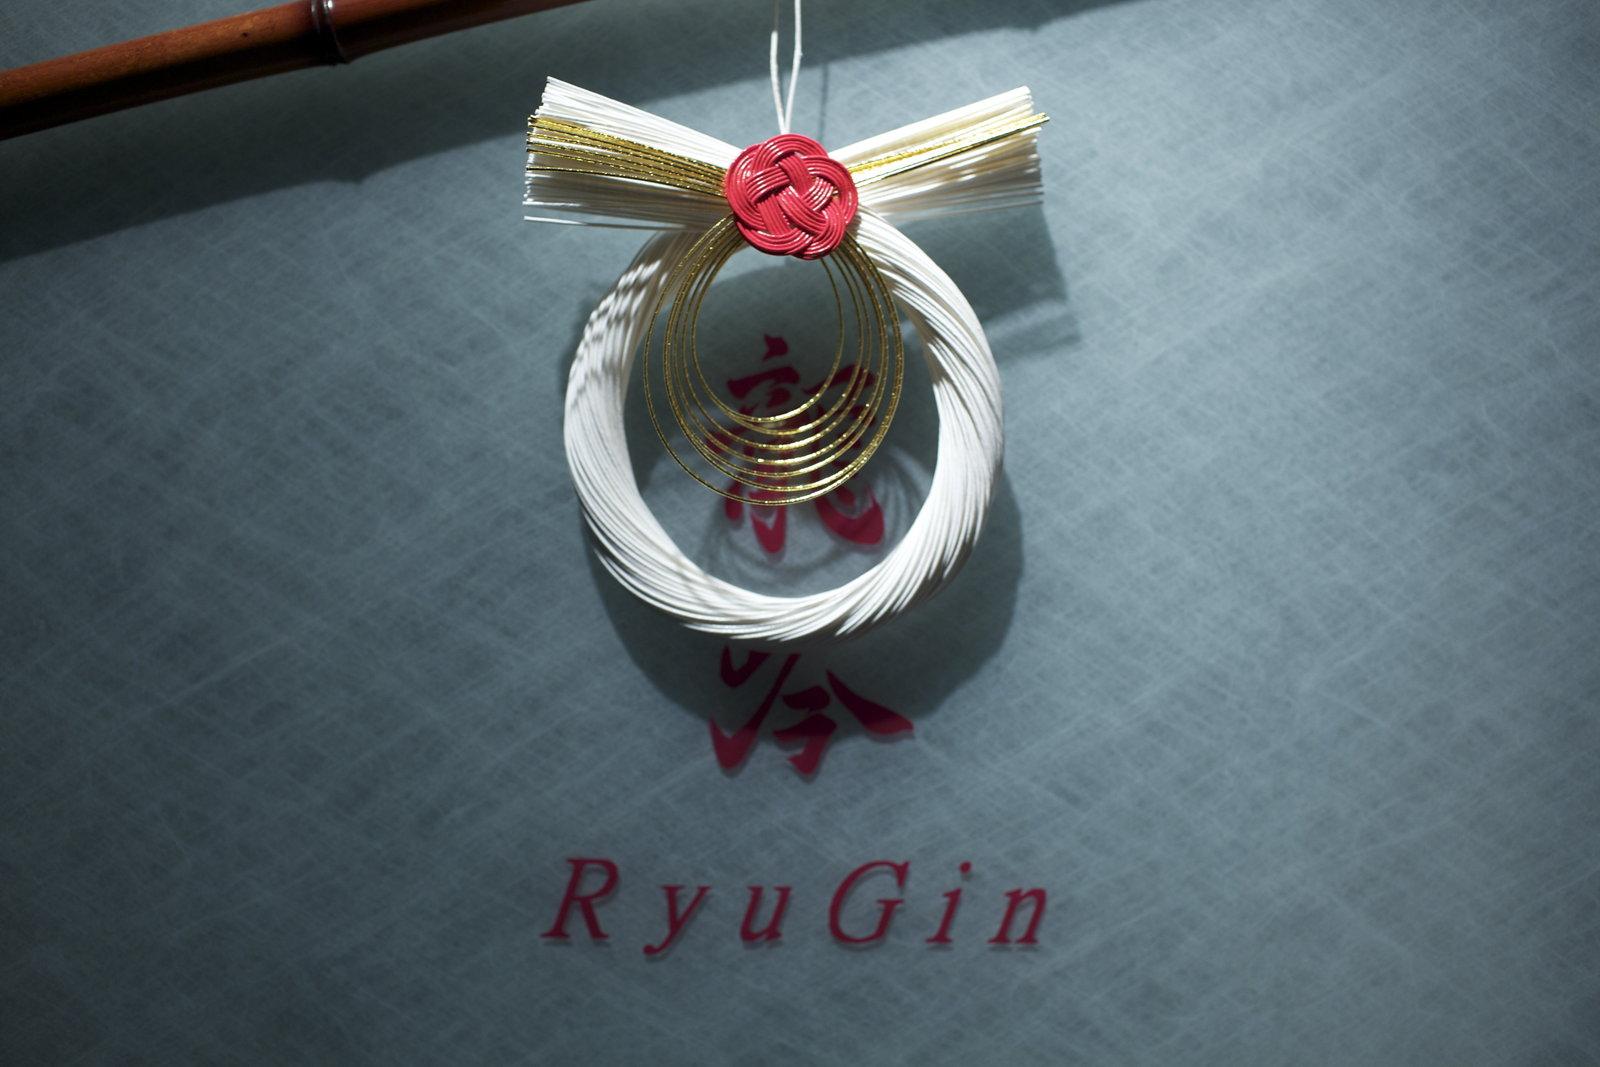 RyuGin - Entrance to RyuGin